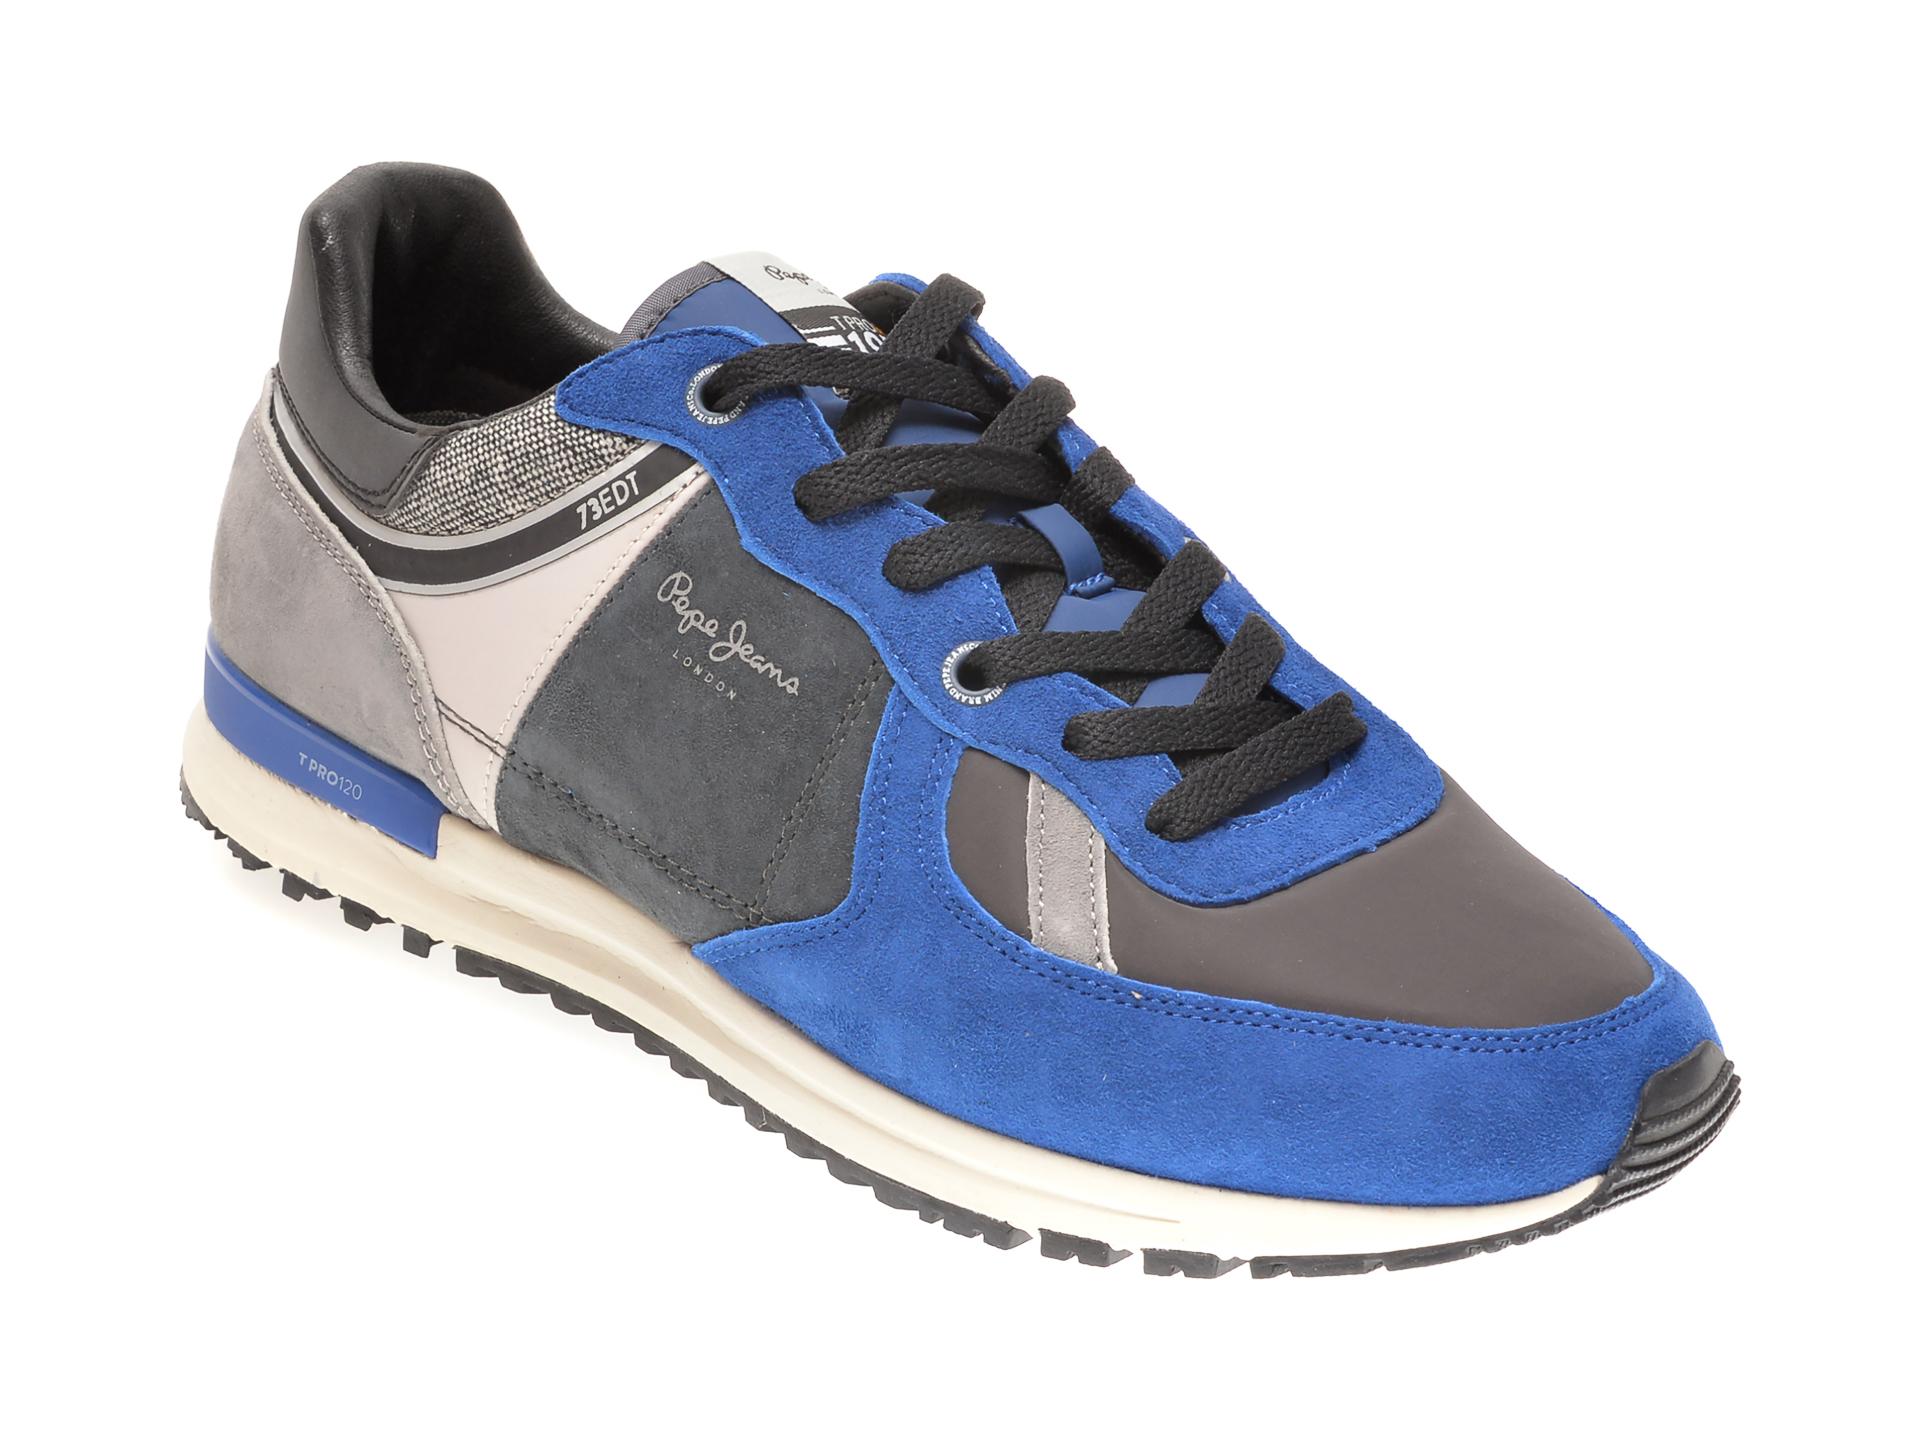 Pantofi sport PEPE JEANS albastri, MS30657, din material textil si piele intoarsa